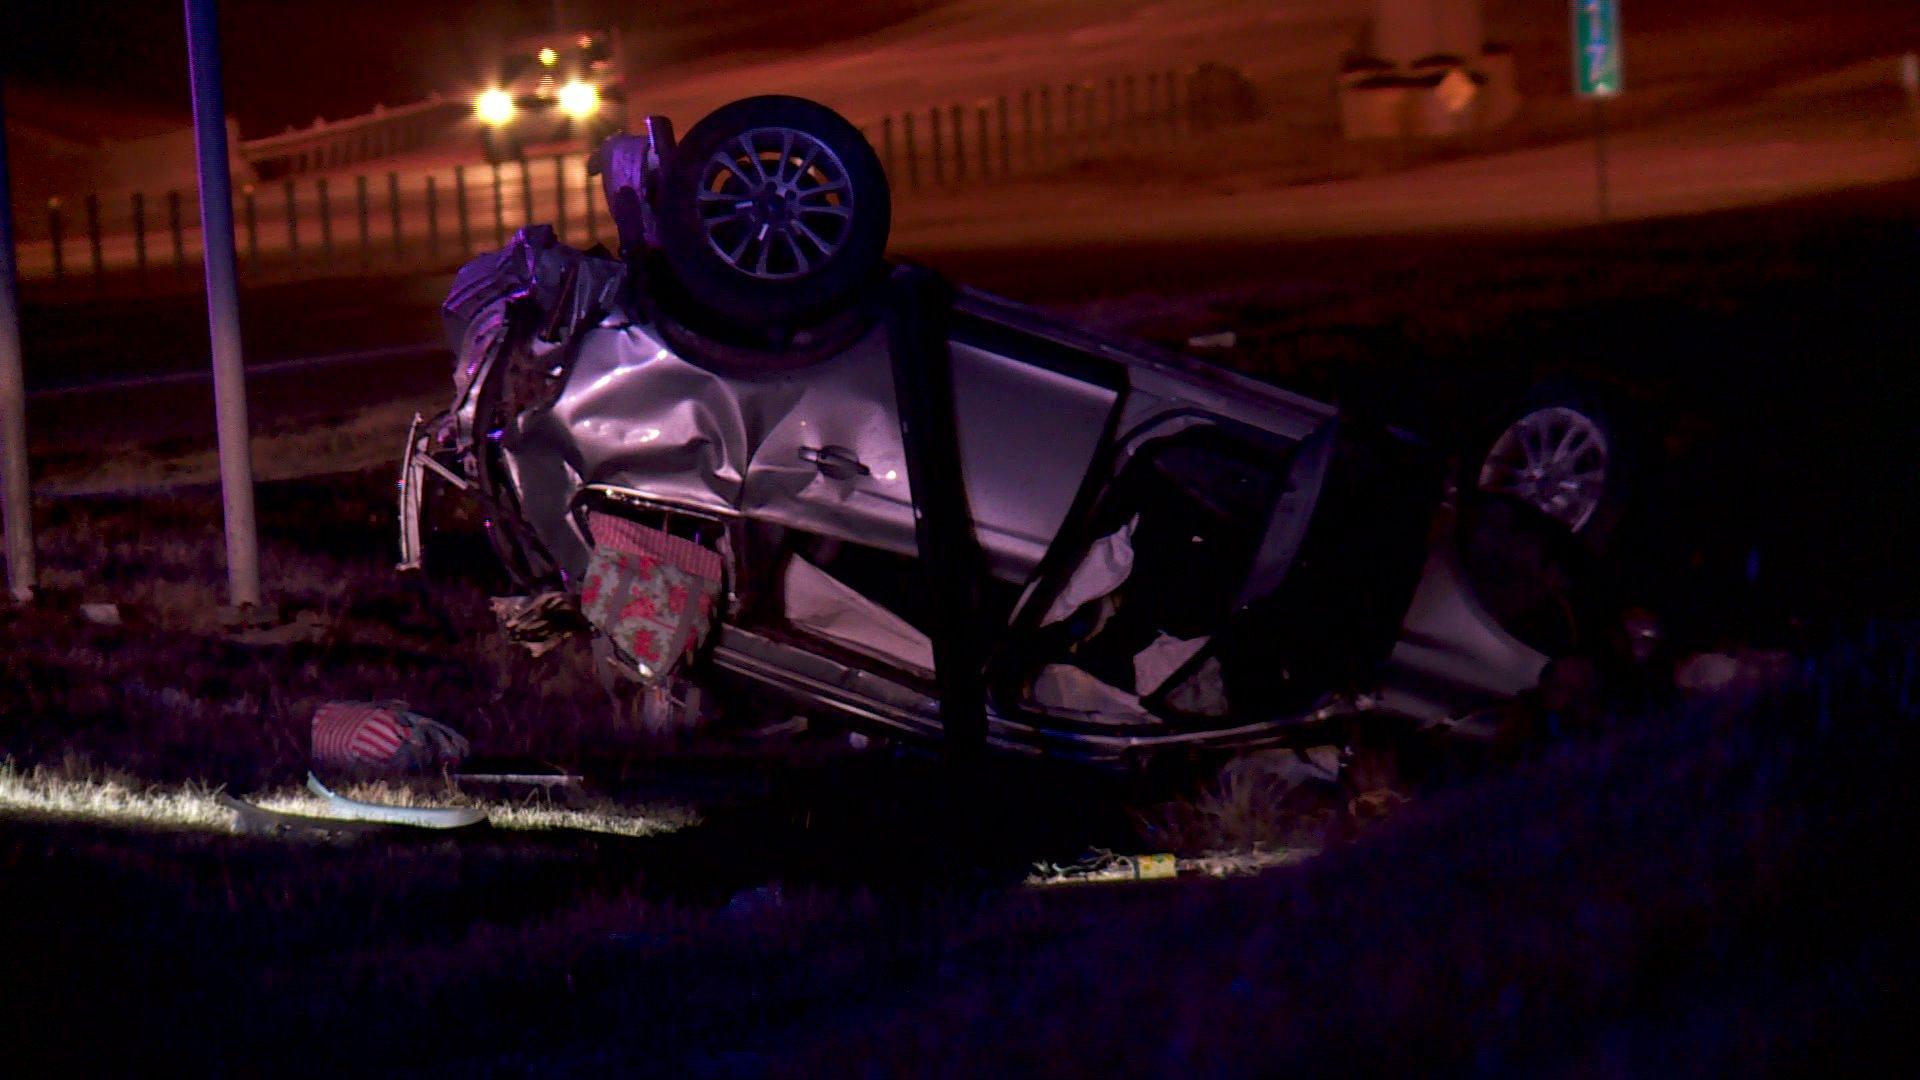 Amanda Carson was pronounced dead following a crash on the Kilpatrick Turnpike.